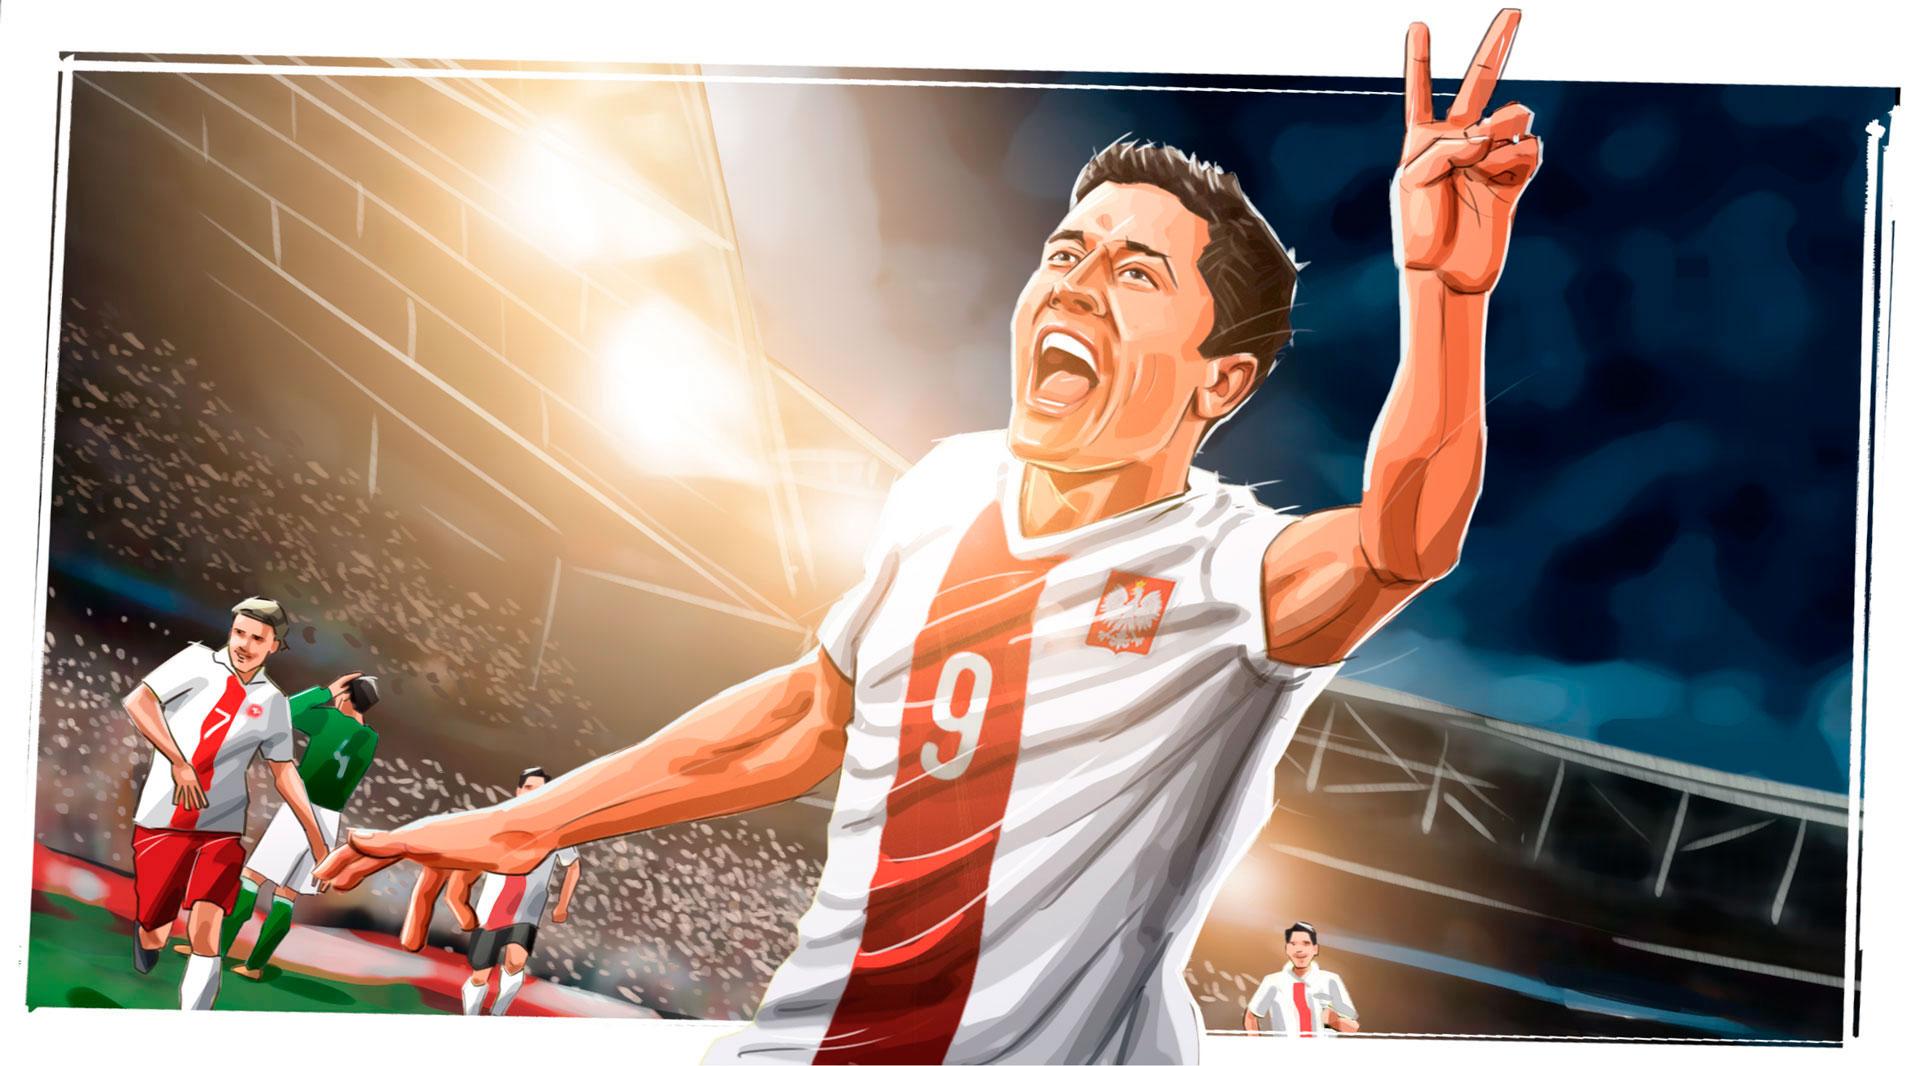 Lewandowski portrait illustration, Famous matches - illustrations for web game